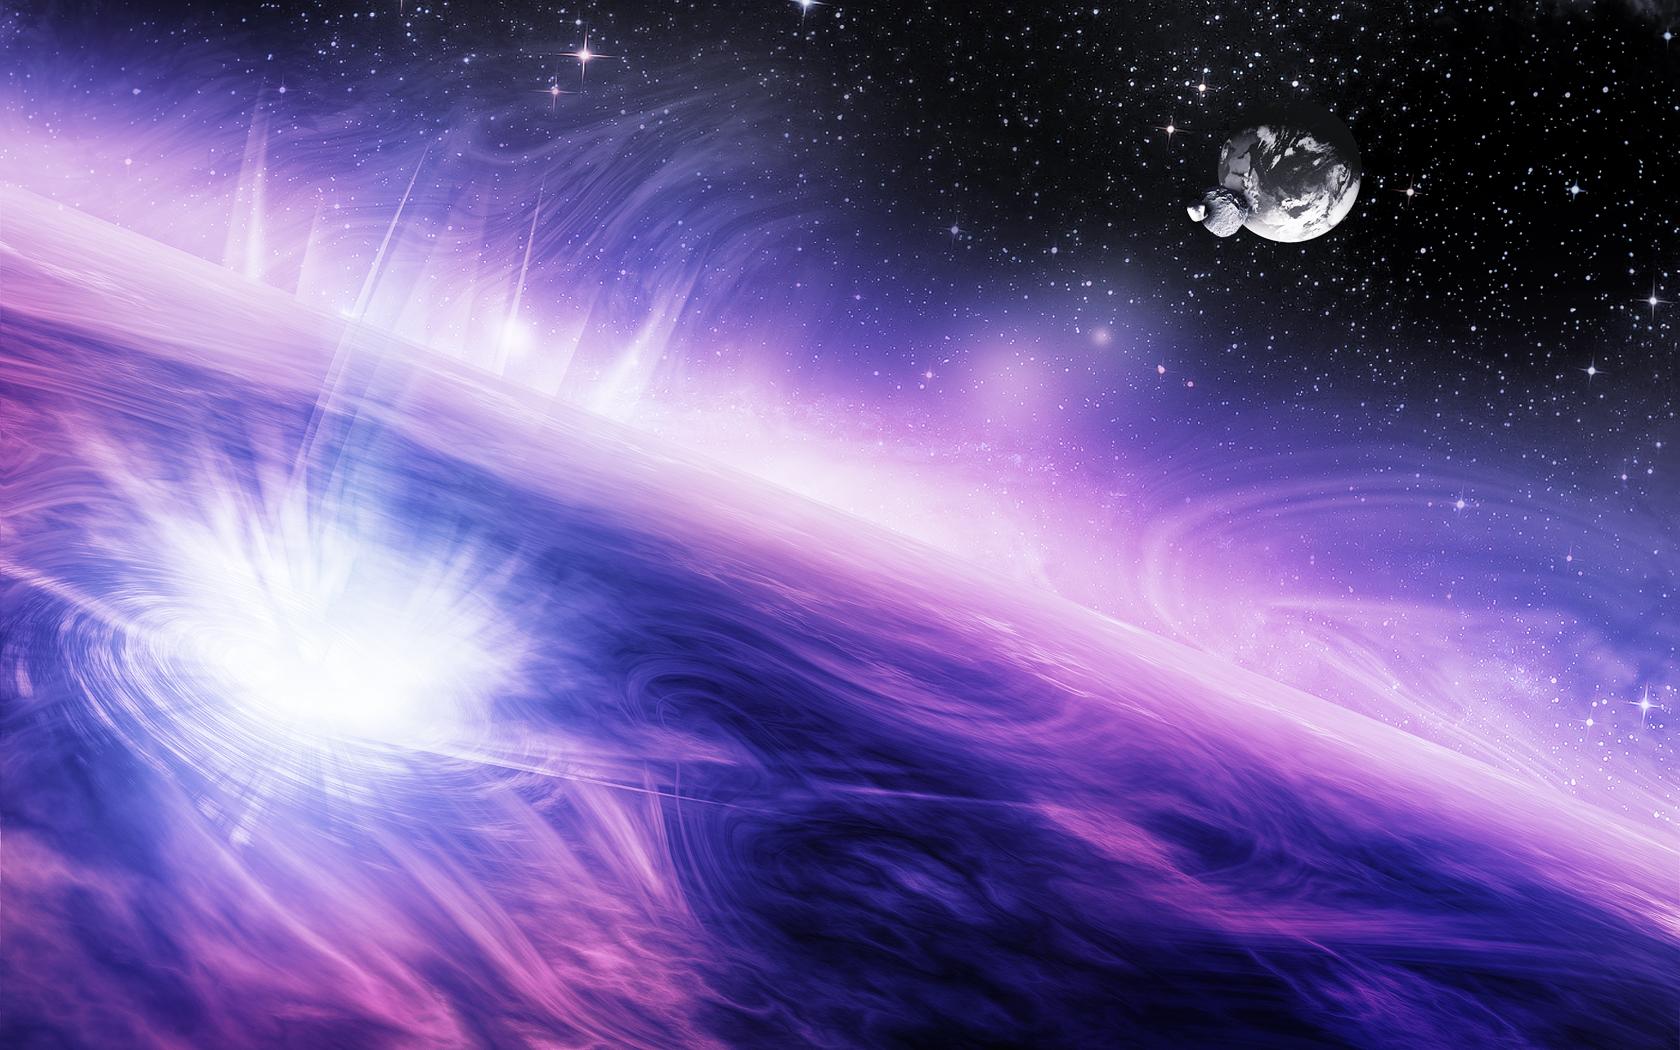 16 Bit Space Background 16 1680x1050